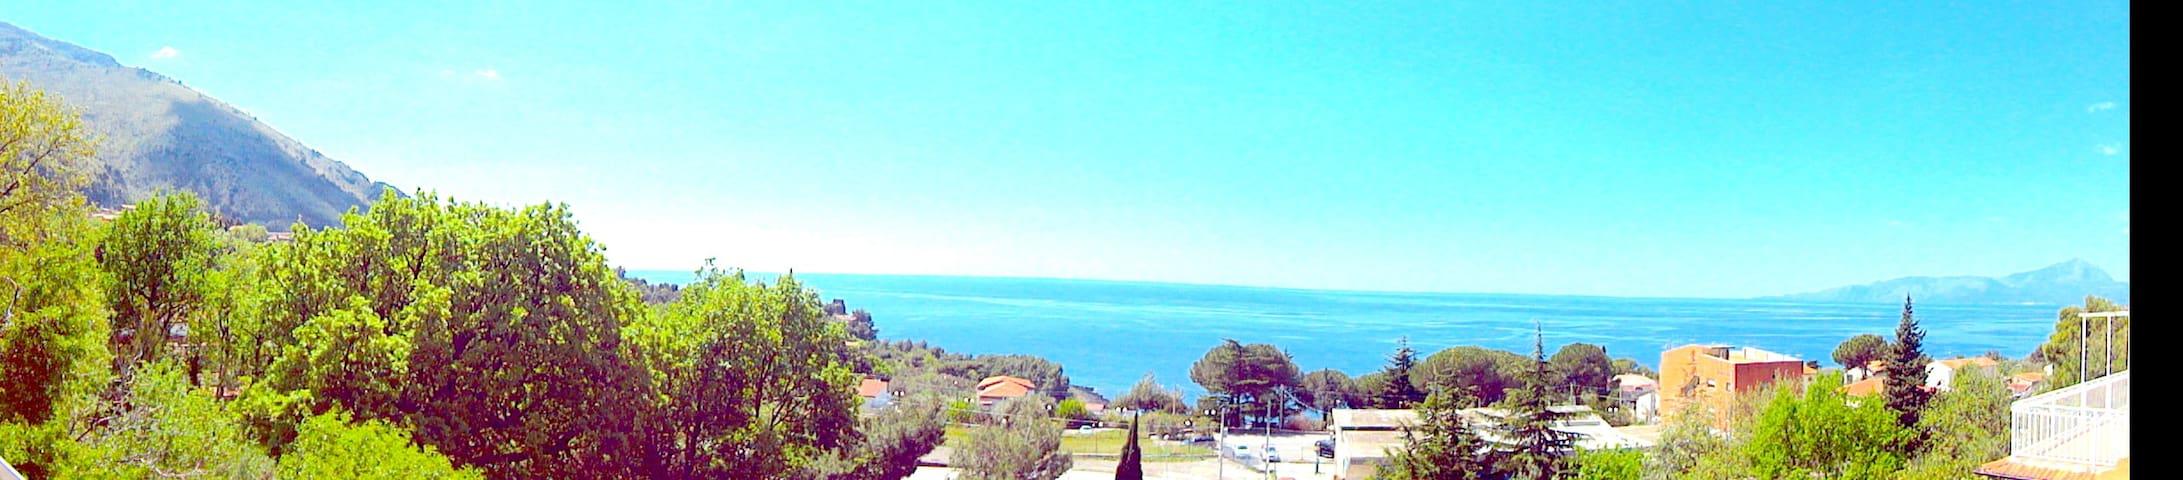 CARDUCCI HOME - gulf view - Acquafredda - อพาร์ทเมนท์